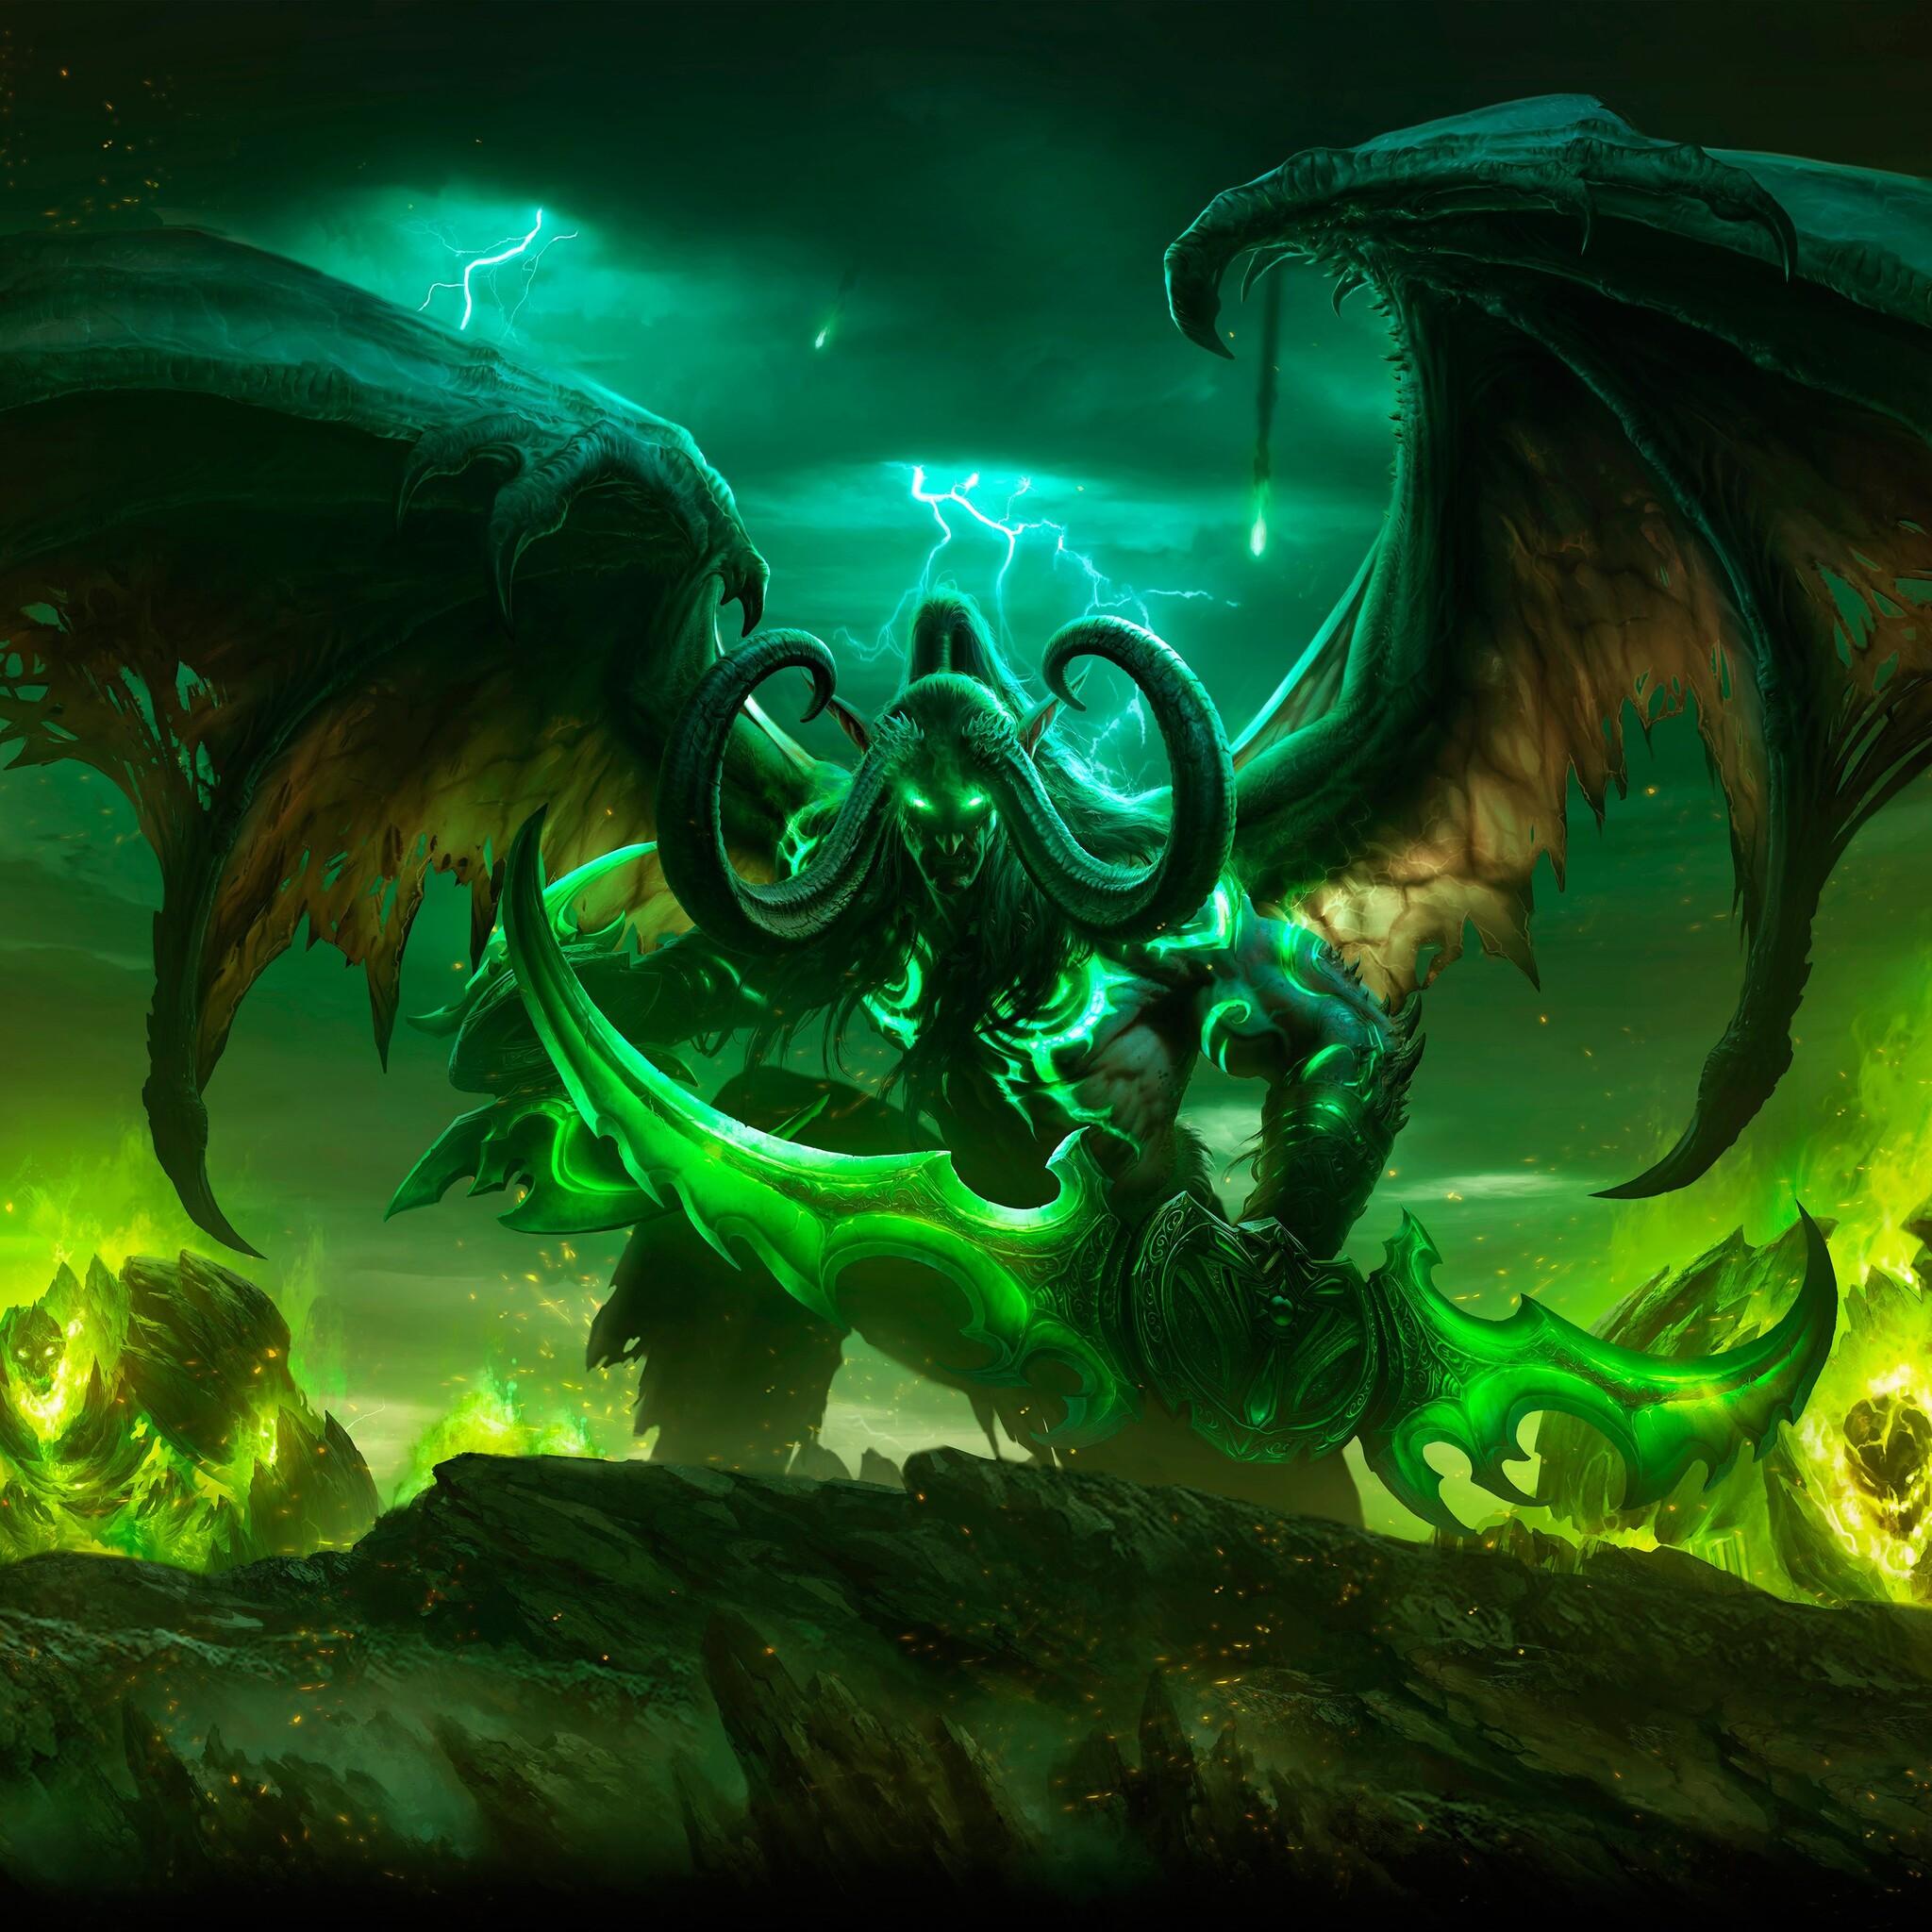 2048x2048 Illidan Stormrag World Of Warcraft Legion 5k Ipad Air Hd